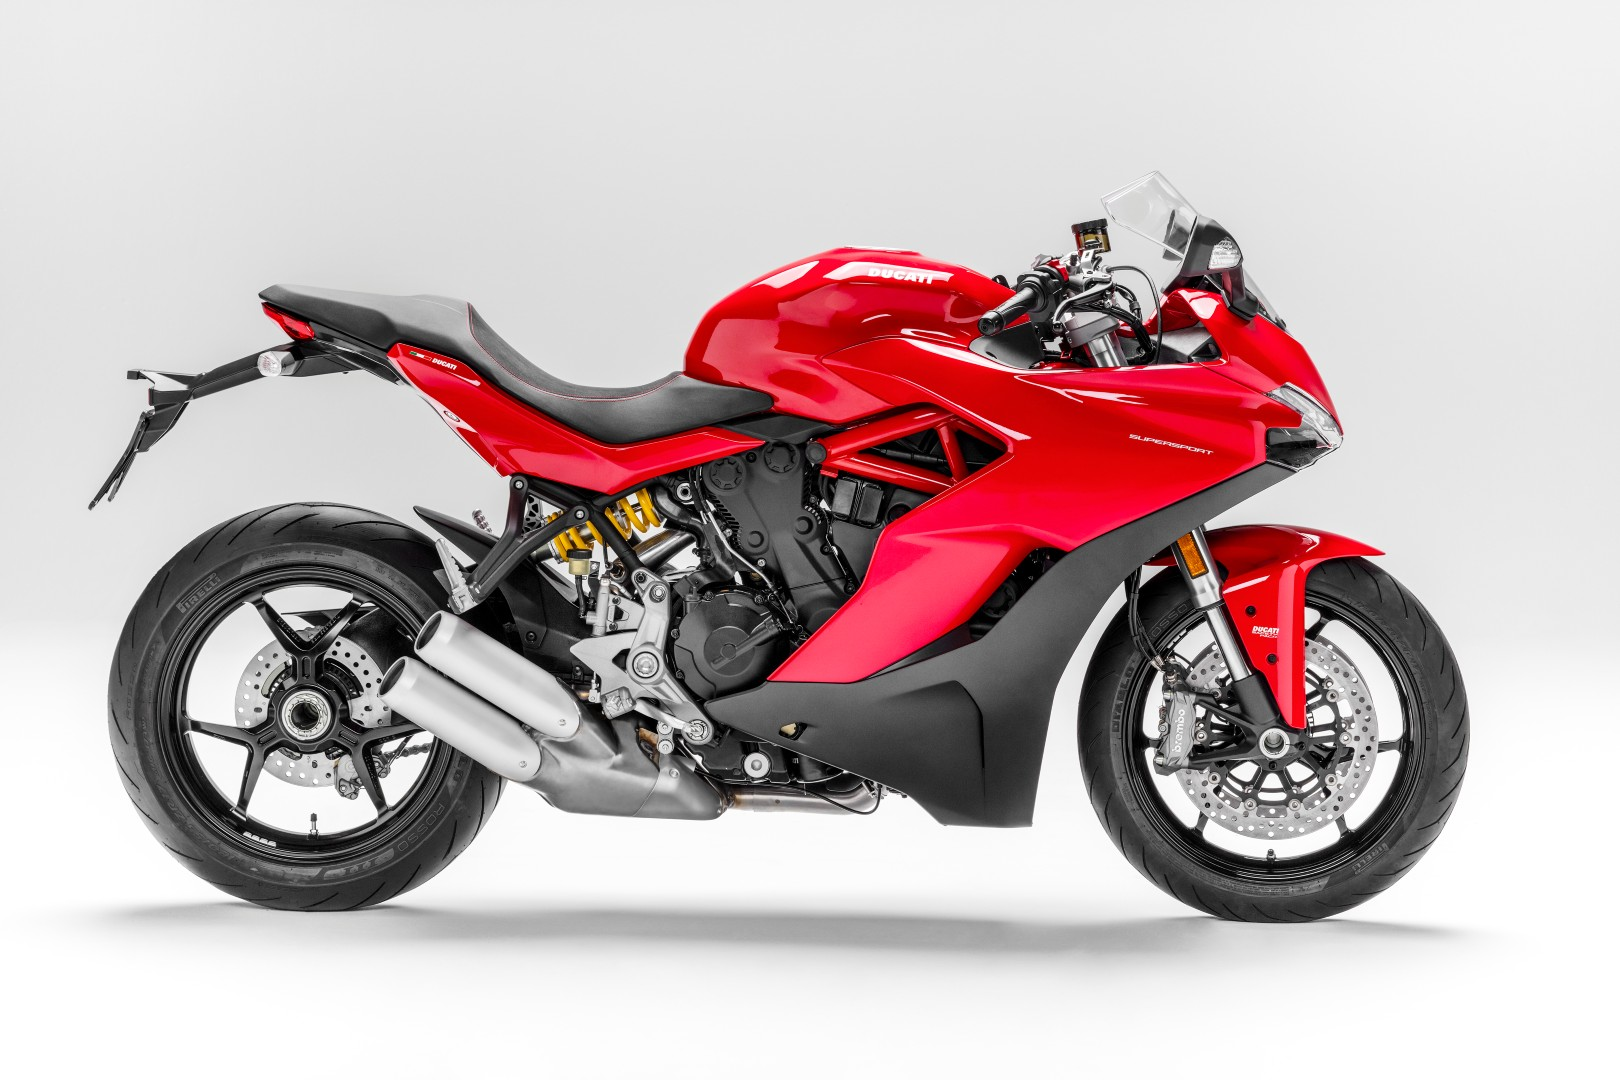 Ducati 939 Supersport/S 2017